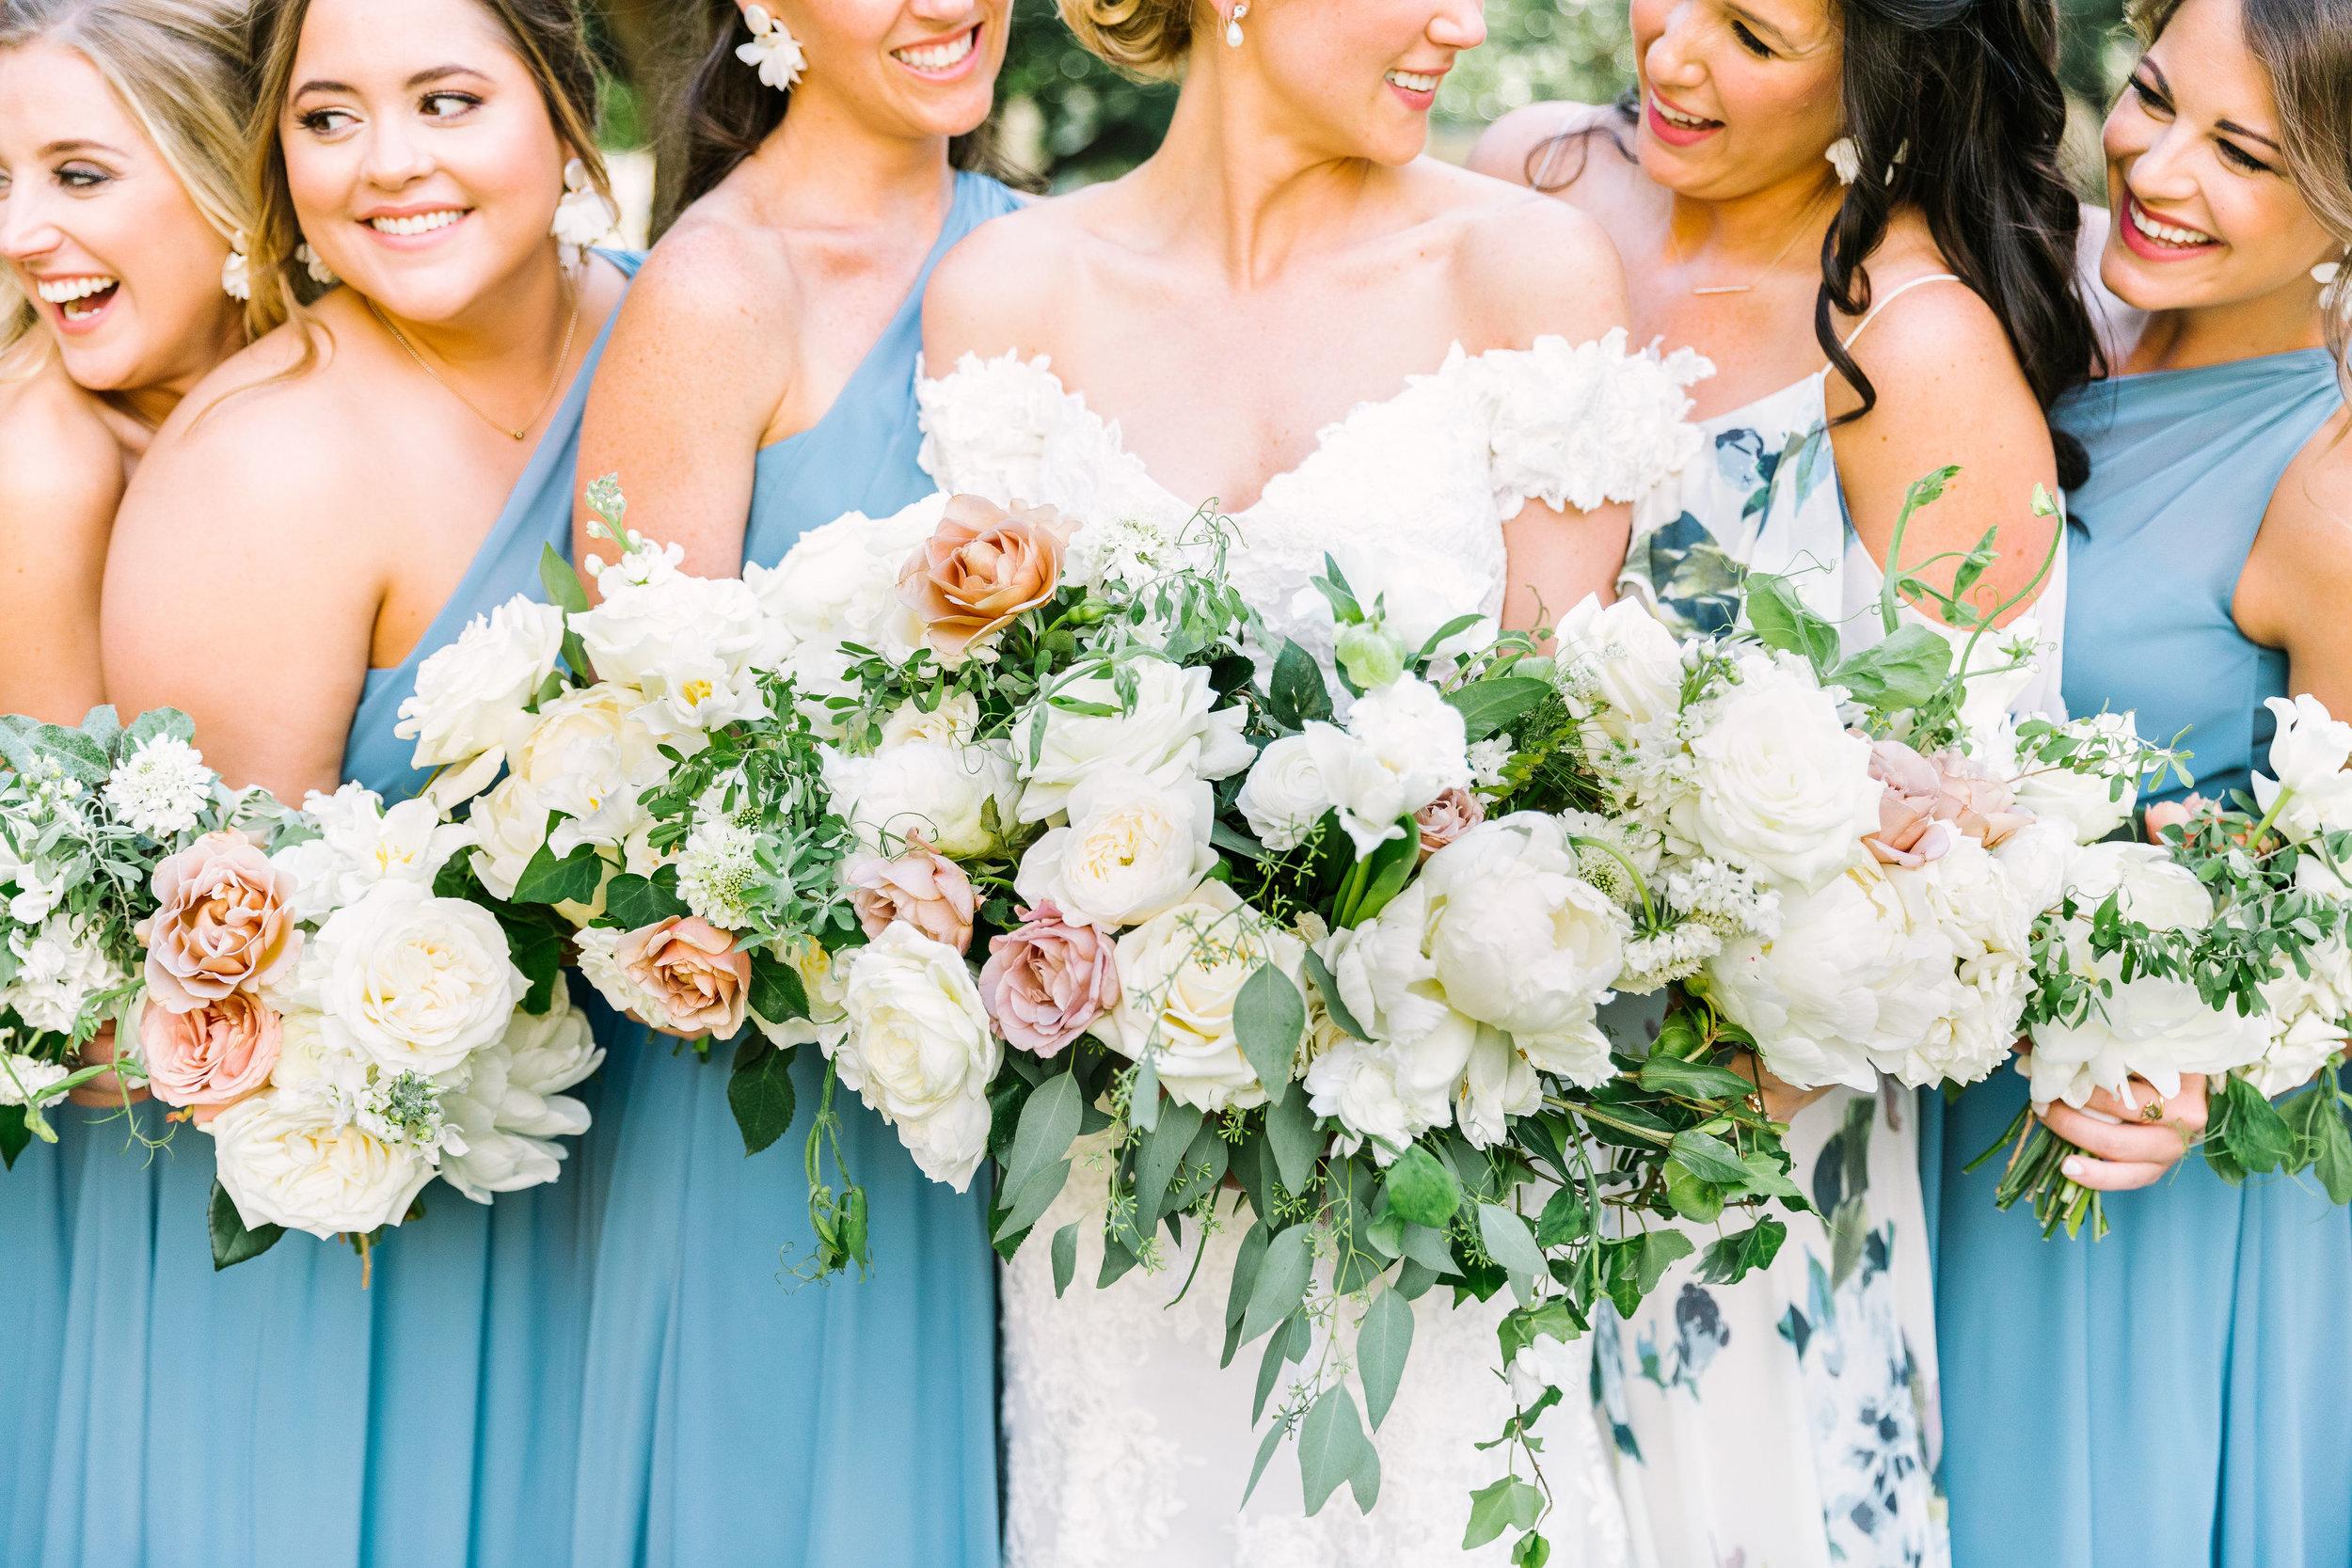 Ellen-Ashton-Photography-Girt-and-gold-events-weddings-Ashton-Depot-Weddings258.jpg